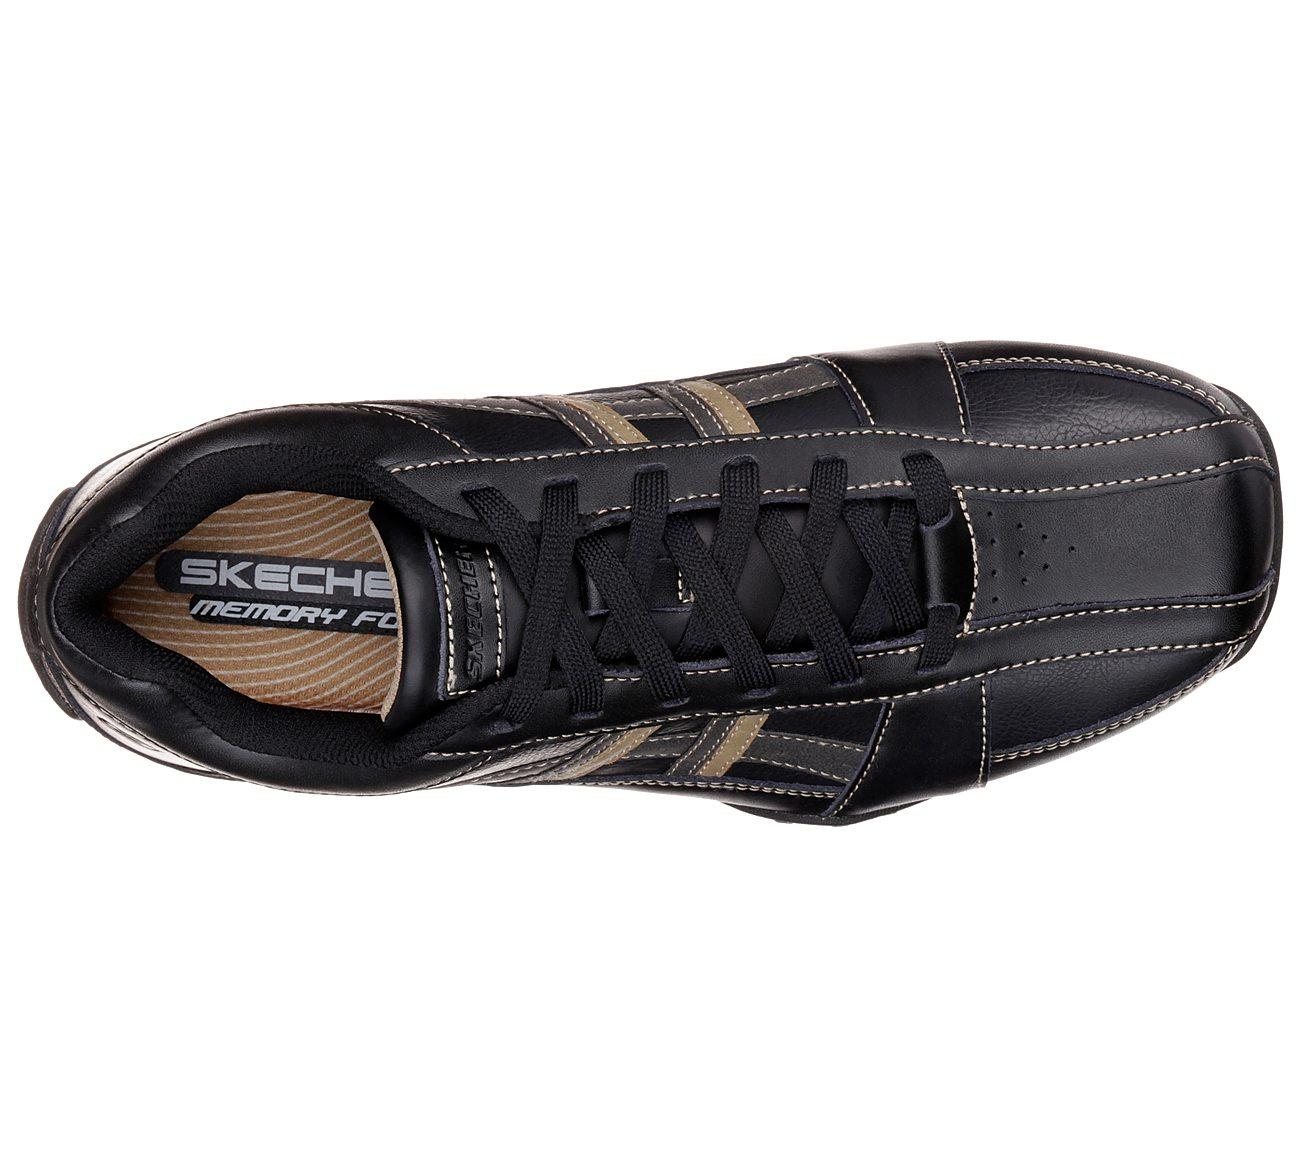 7e7e570cdcfc Buy SKECHERS Citywalk - Malton Modern Comfort Shoes only  57.00